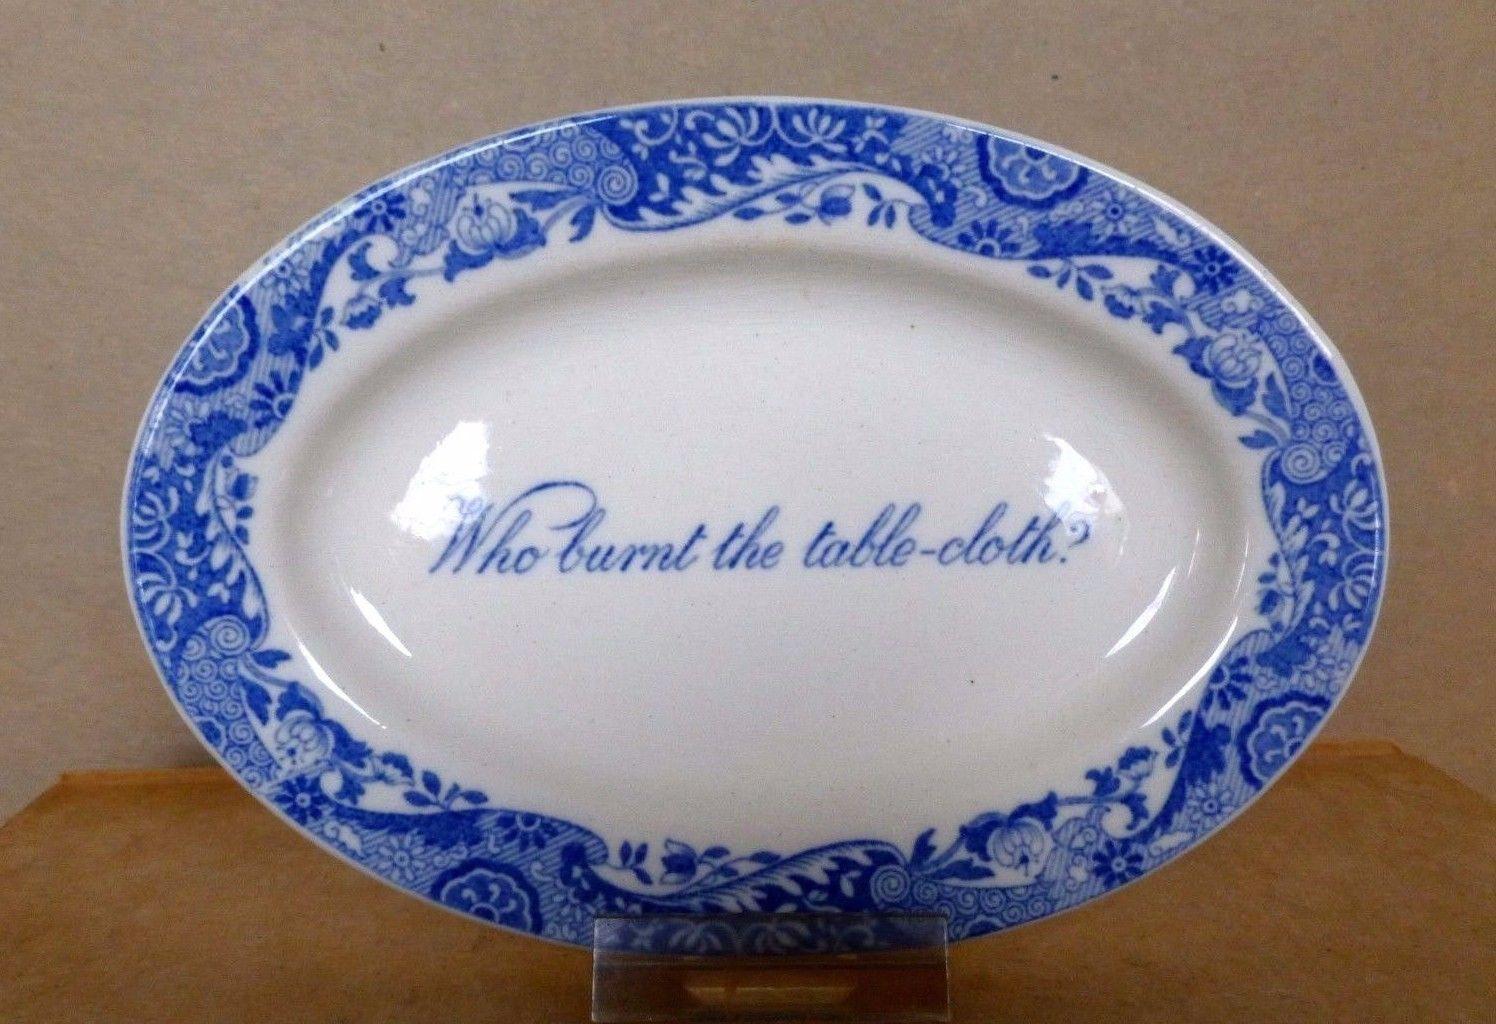 Copeland Spode Blue Italian Platter Who Burnt the Table-cloth? Miniature C.1900 - $89.95